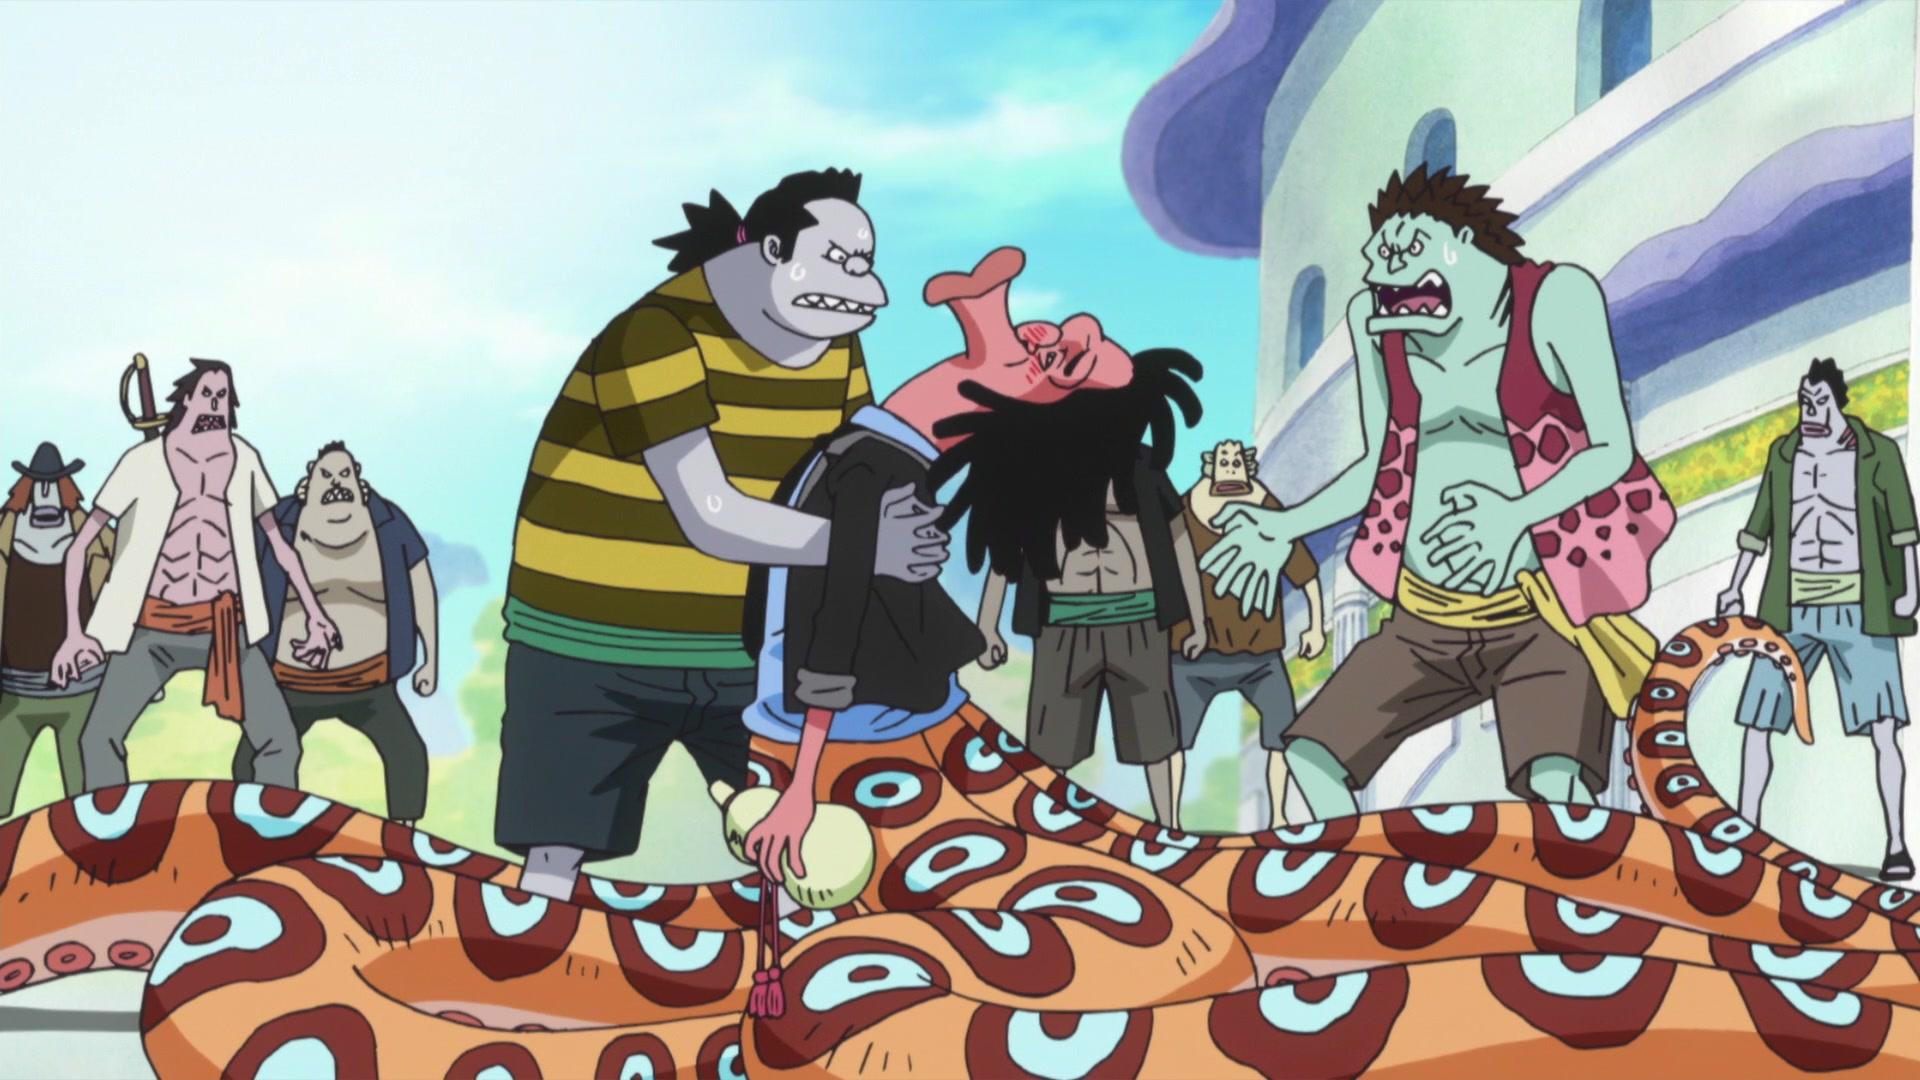 One Piece: Fishman Island (517-574) Episode 550, Something Has